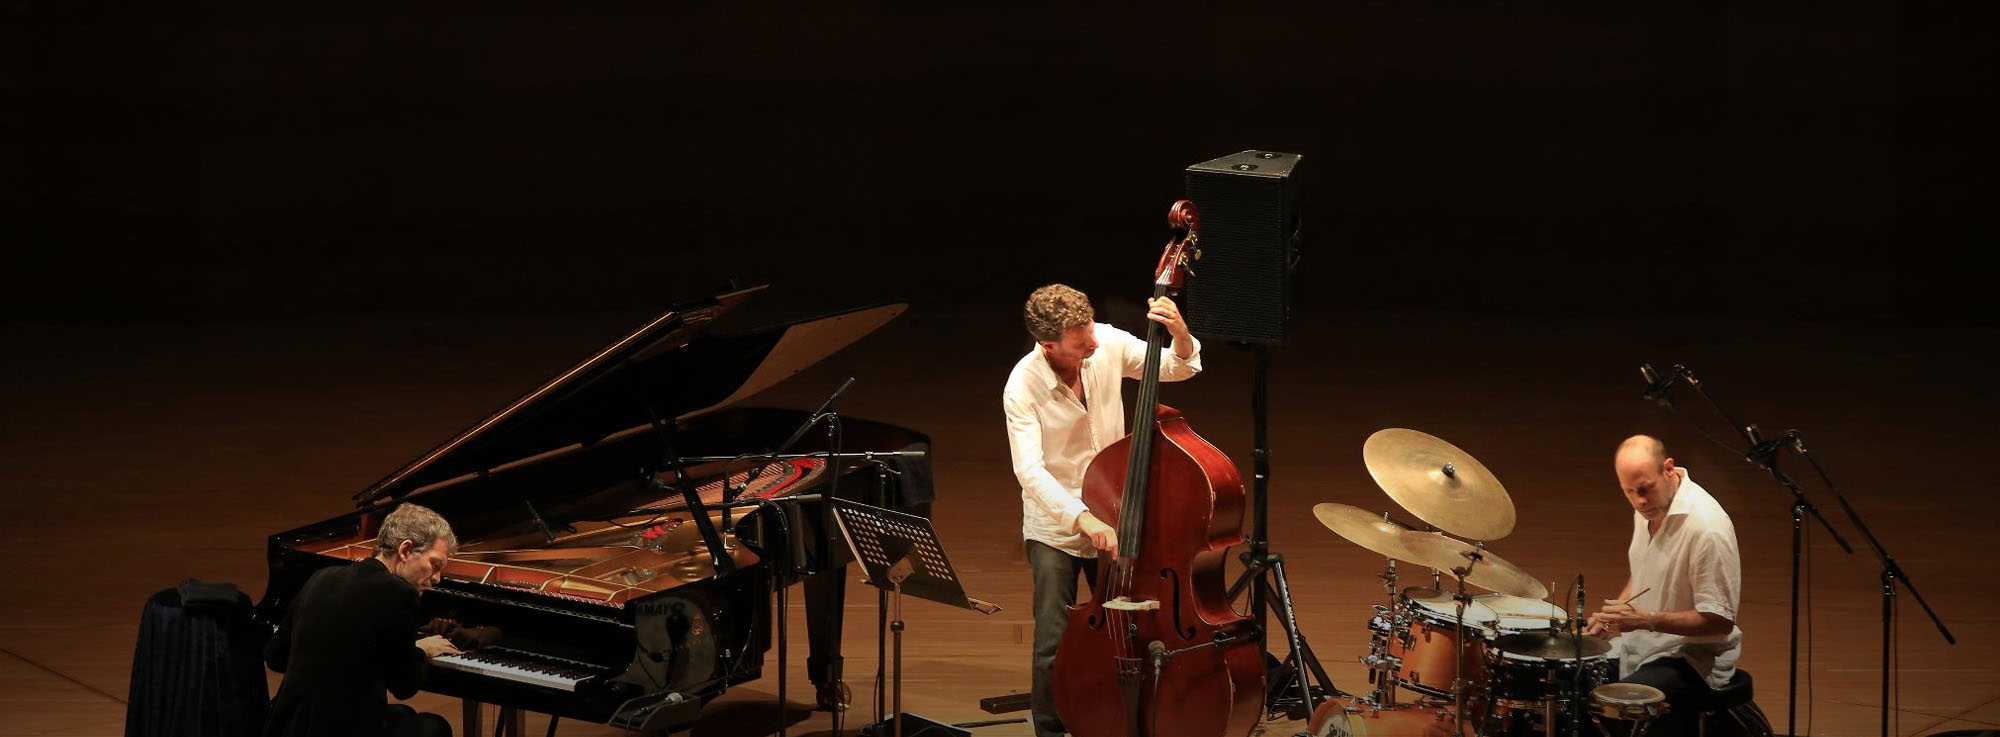 Foggia: Brad Mehldau live